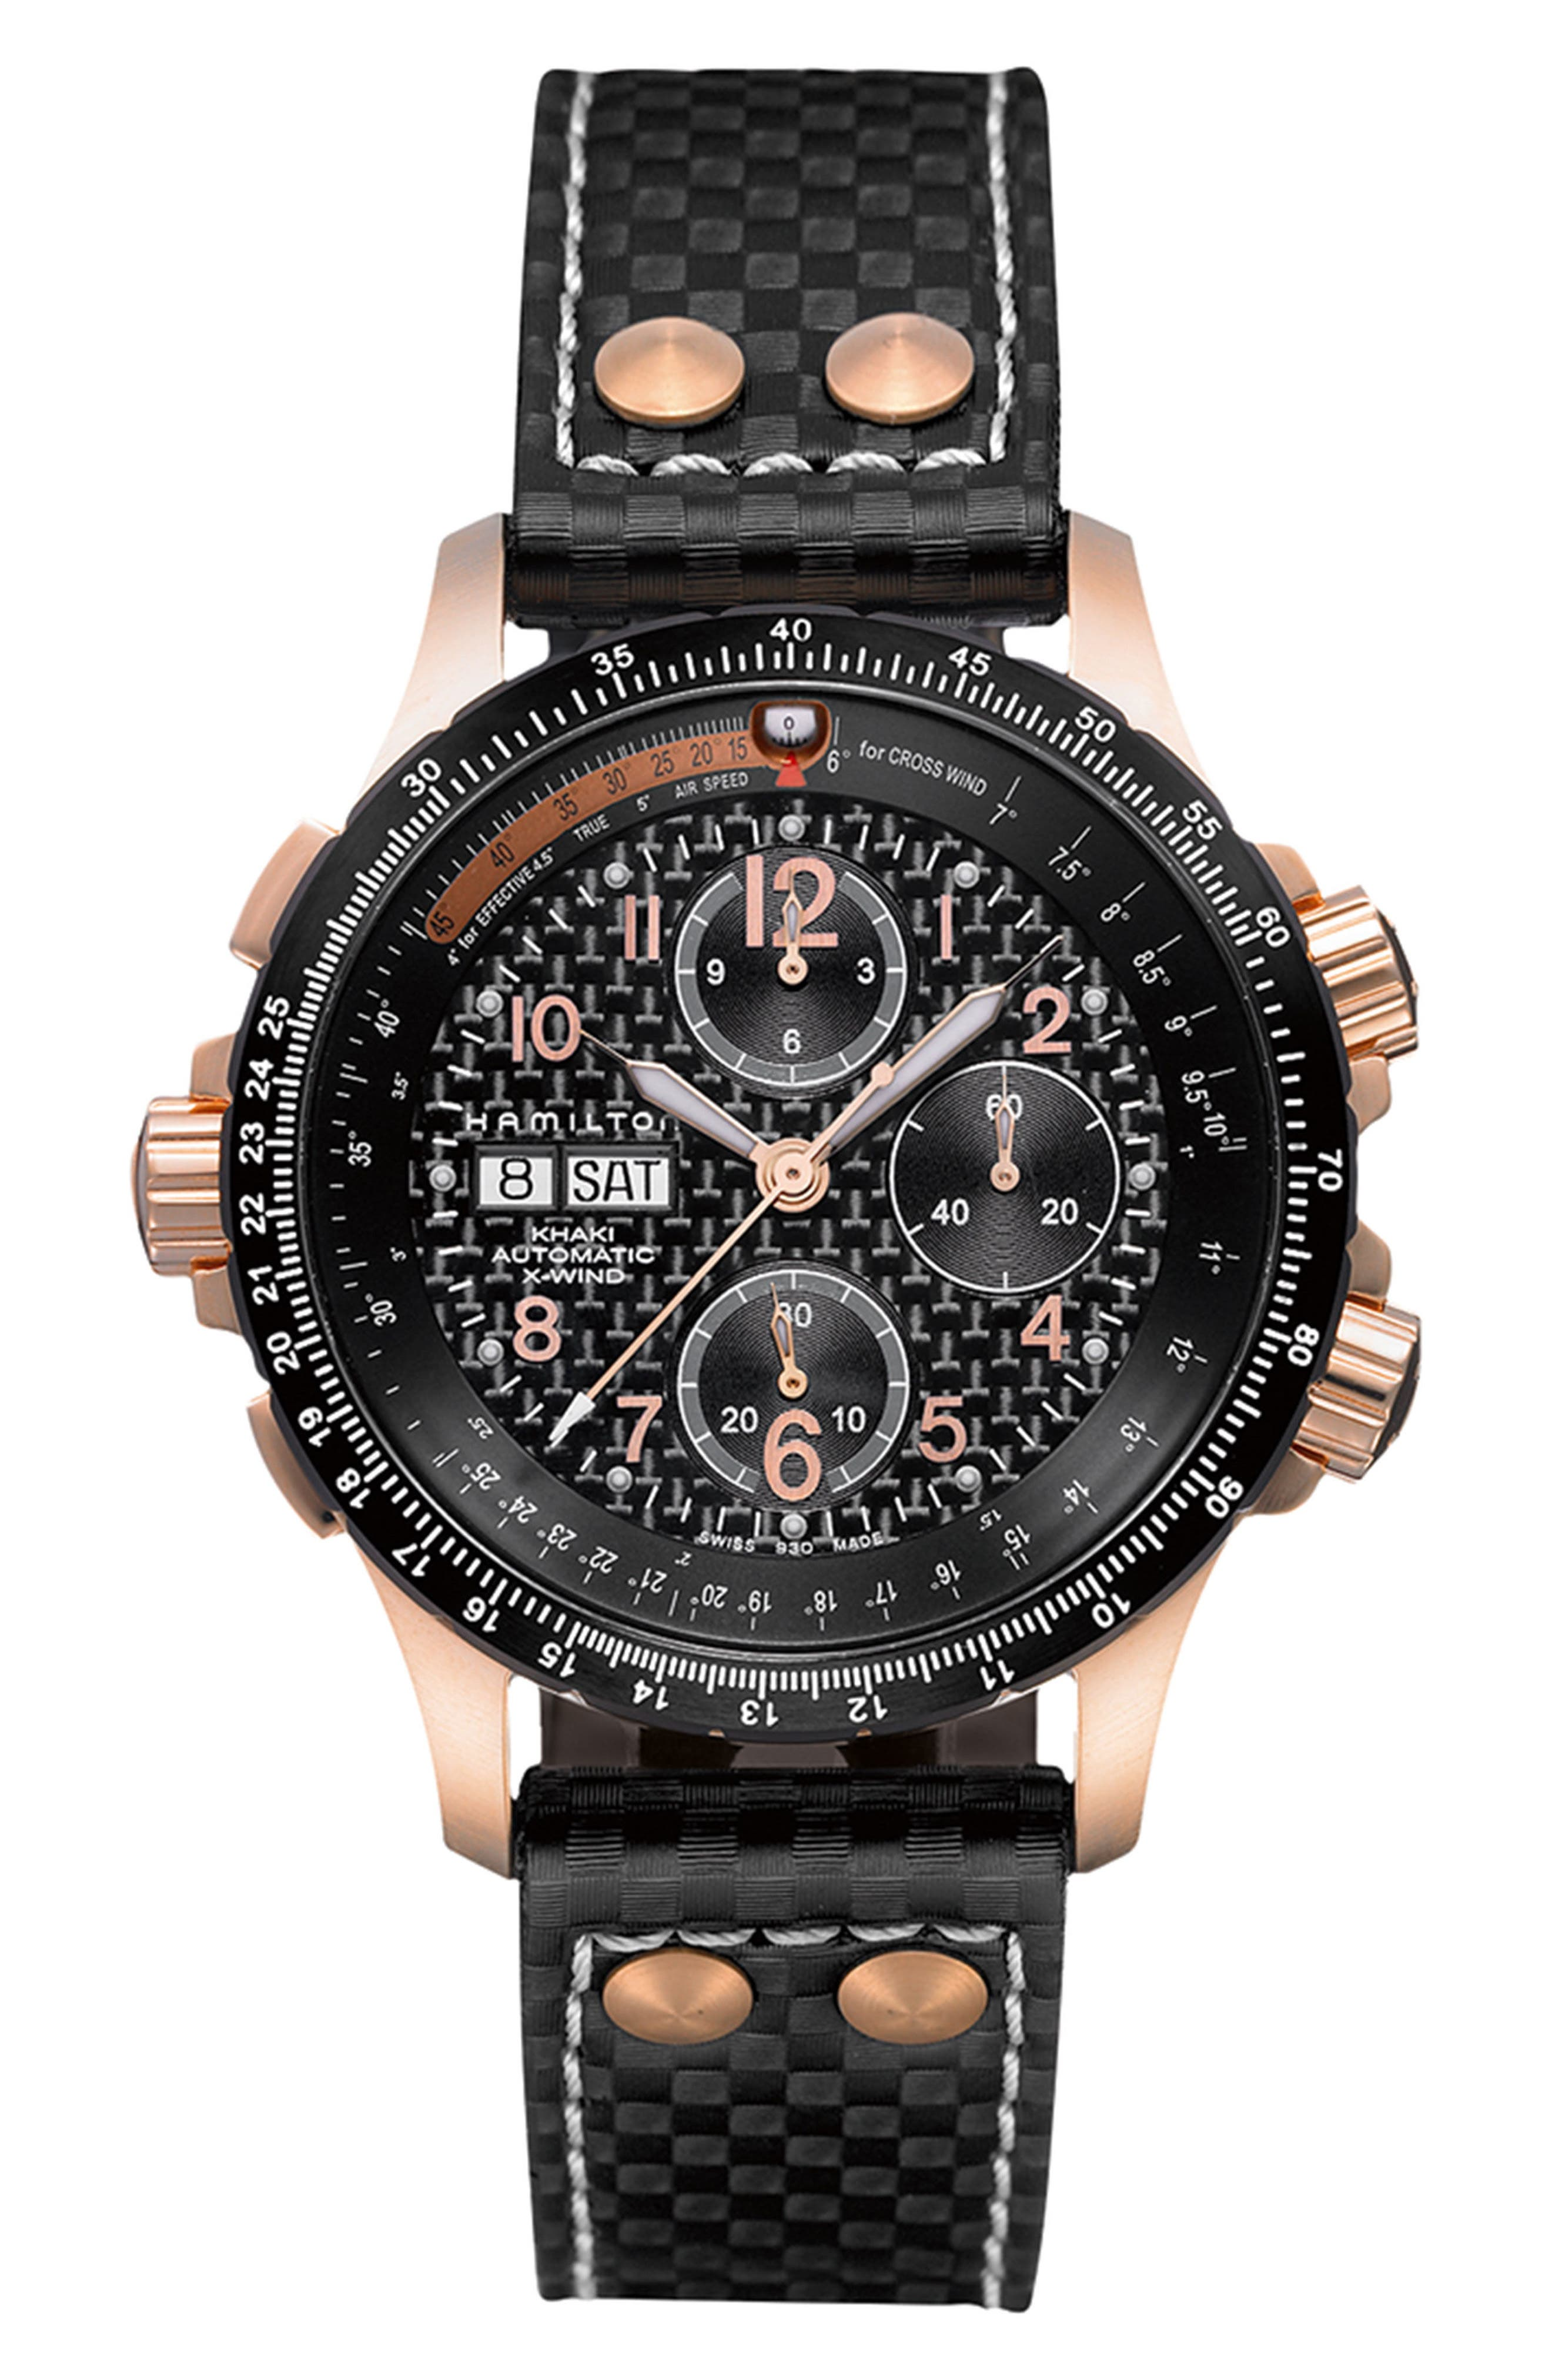 Hamilton Khaki X-Wind Automatic Chronograph Leather Strap Watch, 44mm